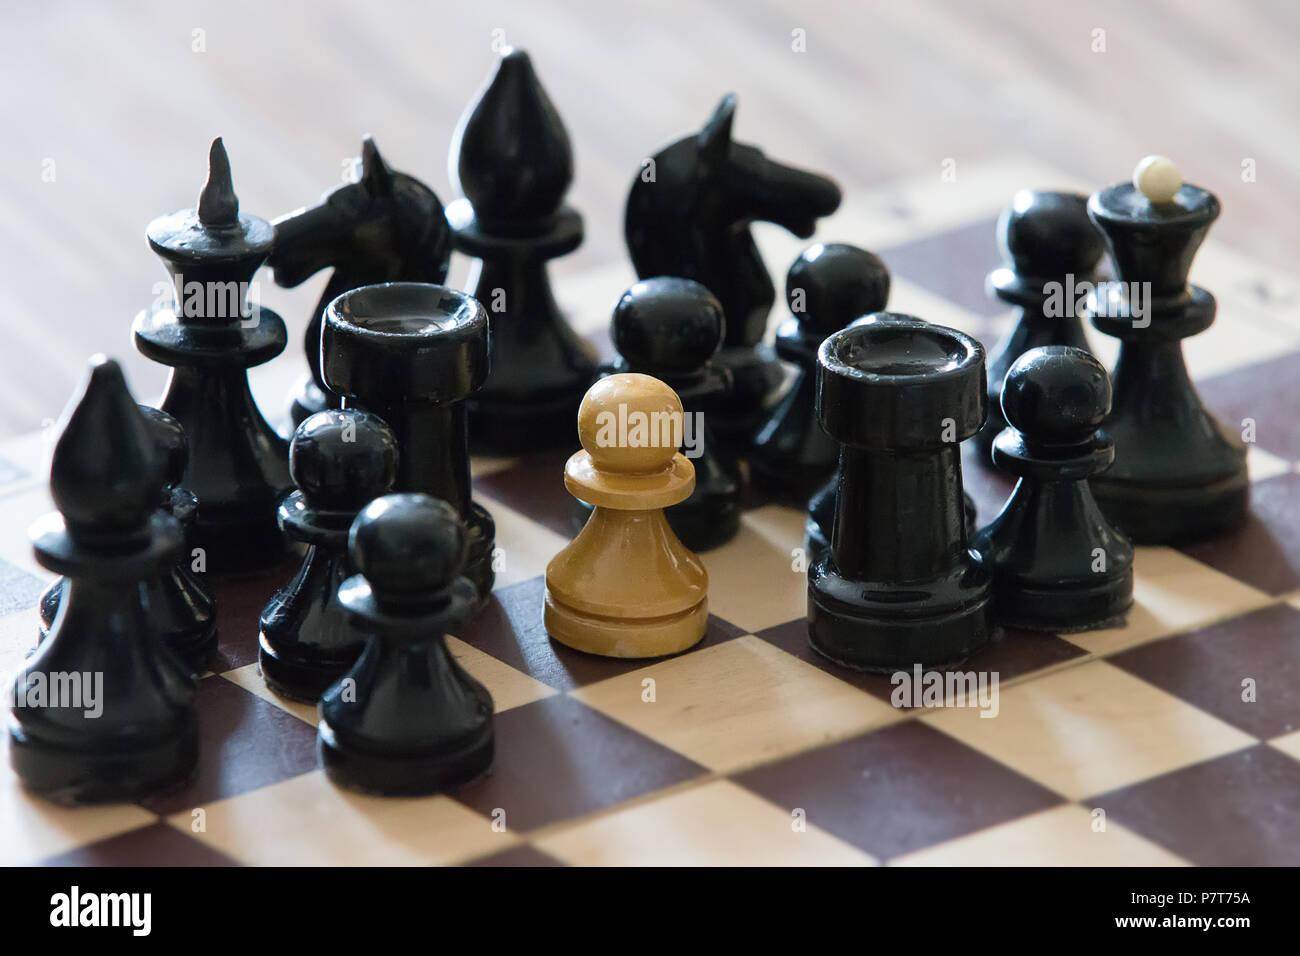 Chessmen. Concept white and black - Stock Image